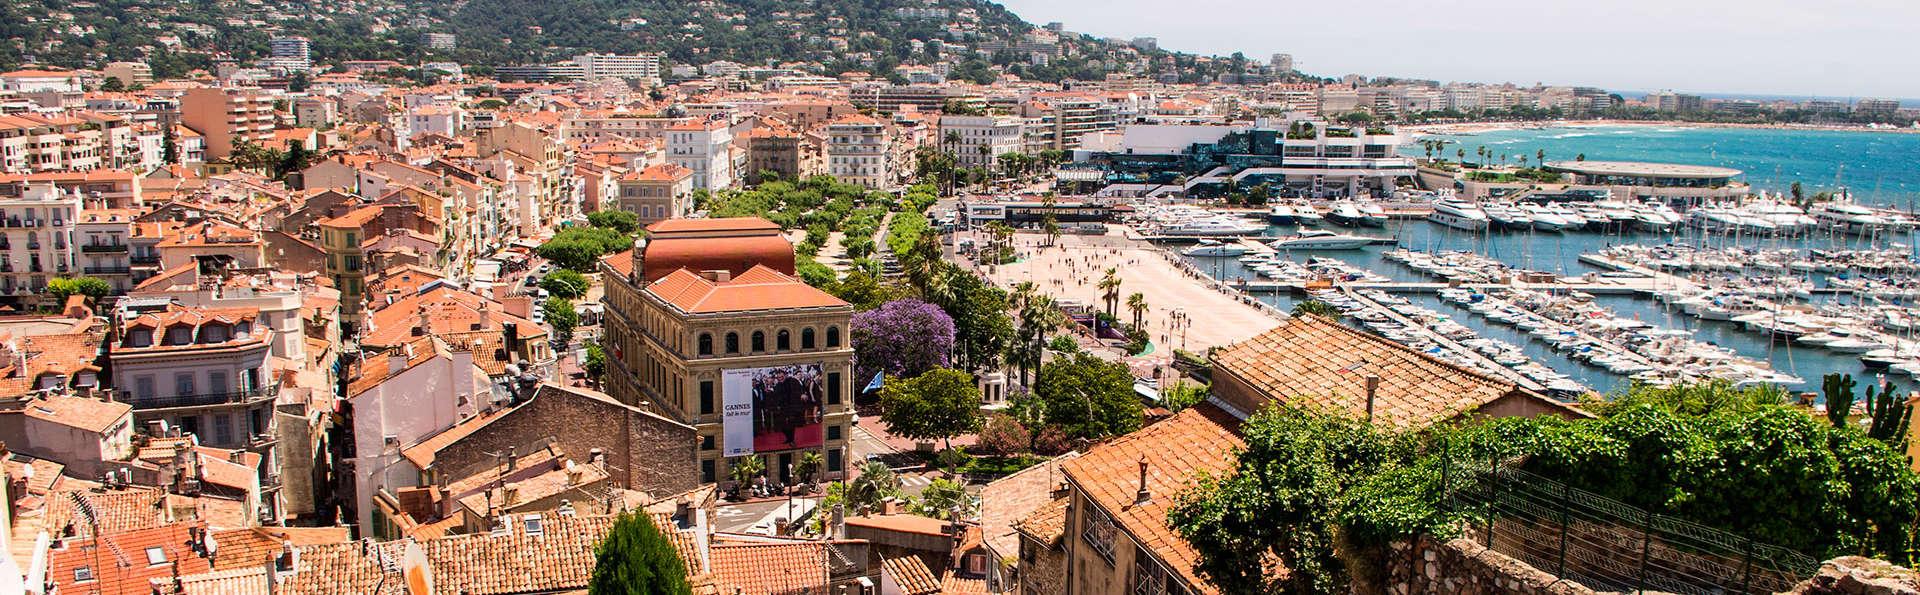 Week-end privilège à Cannes